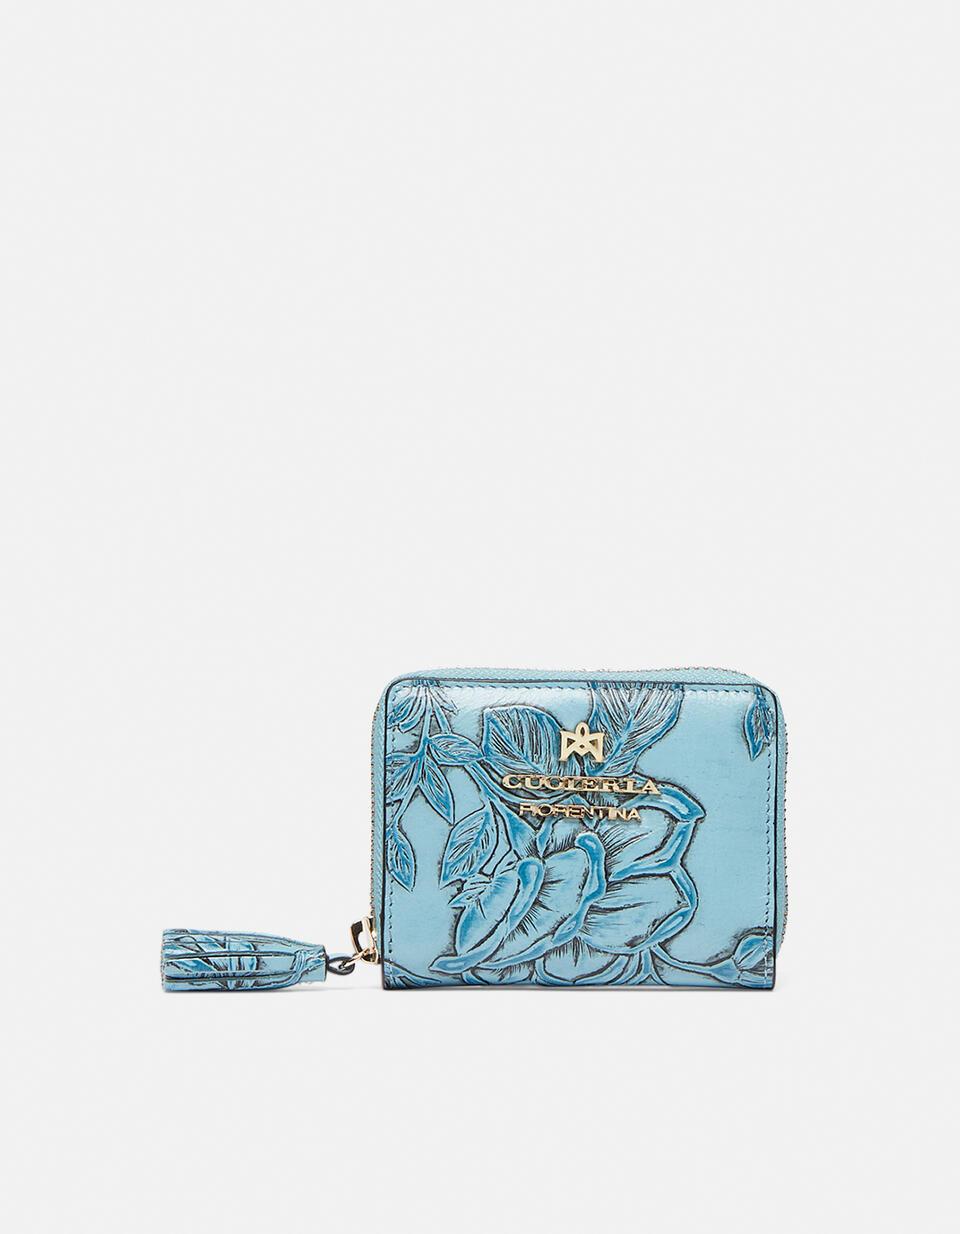 Mini accordion wallet in rose embossed printed leather Mimì CELESTE Cuoieria Fiorentina